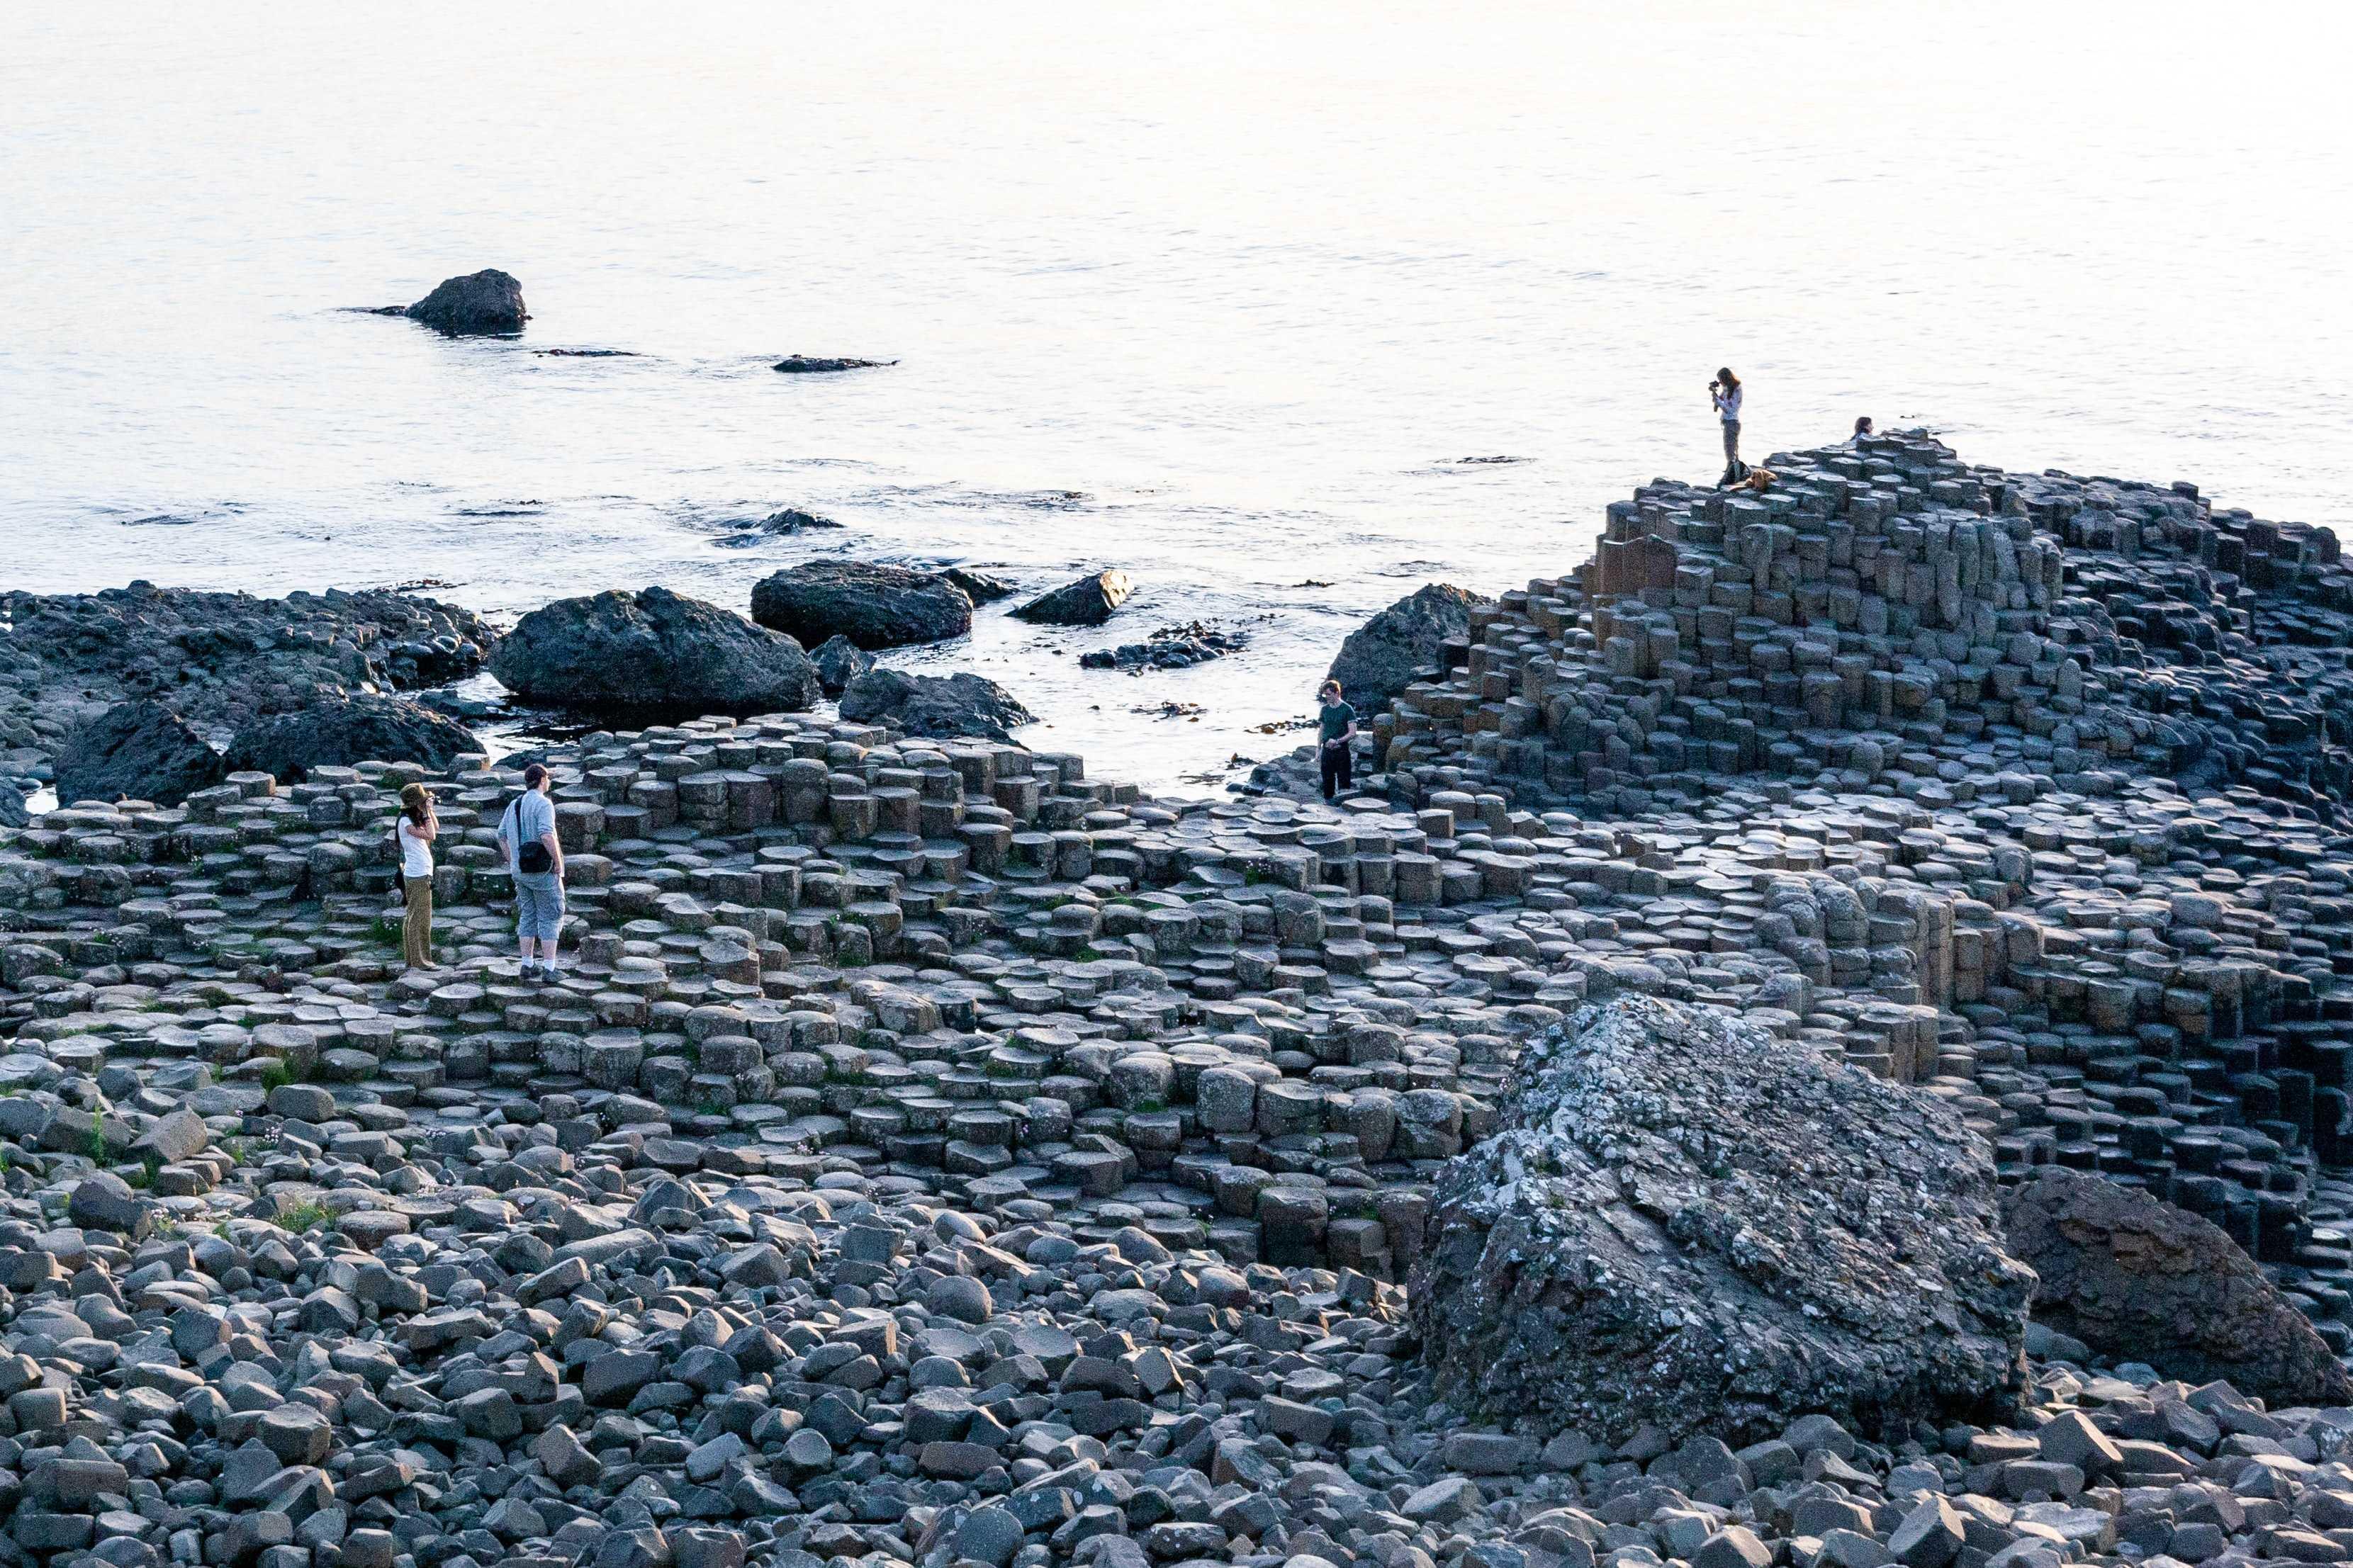 The Giant's Causeway Coastal Walk